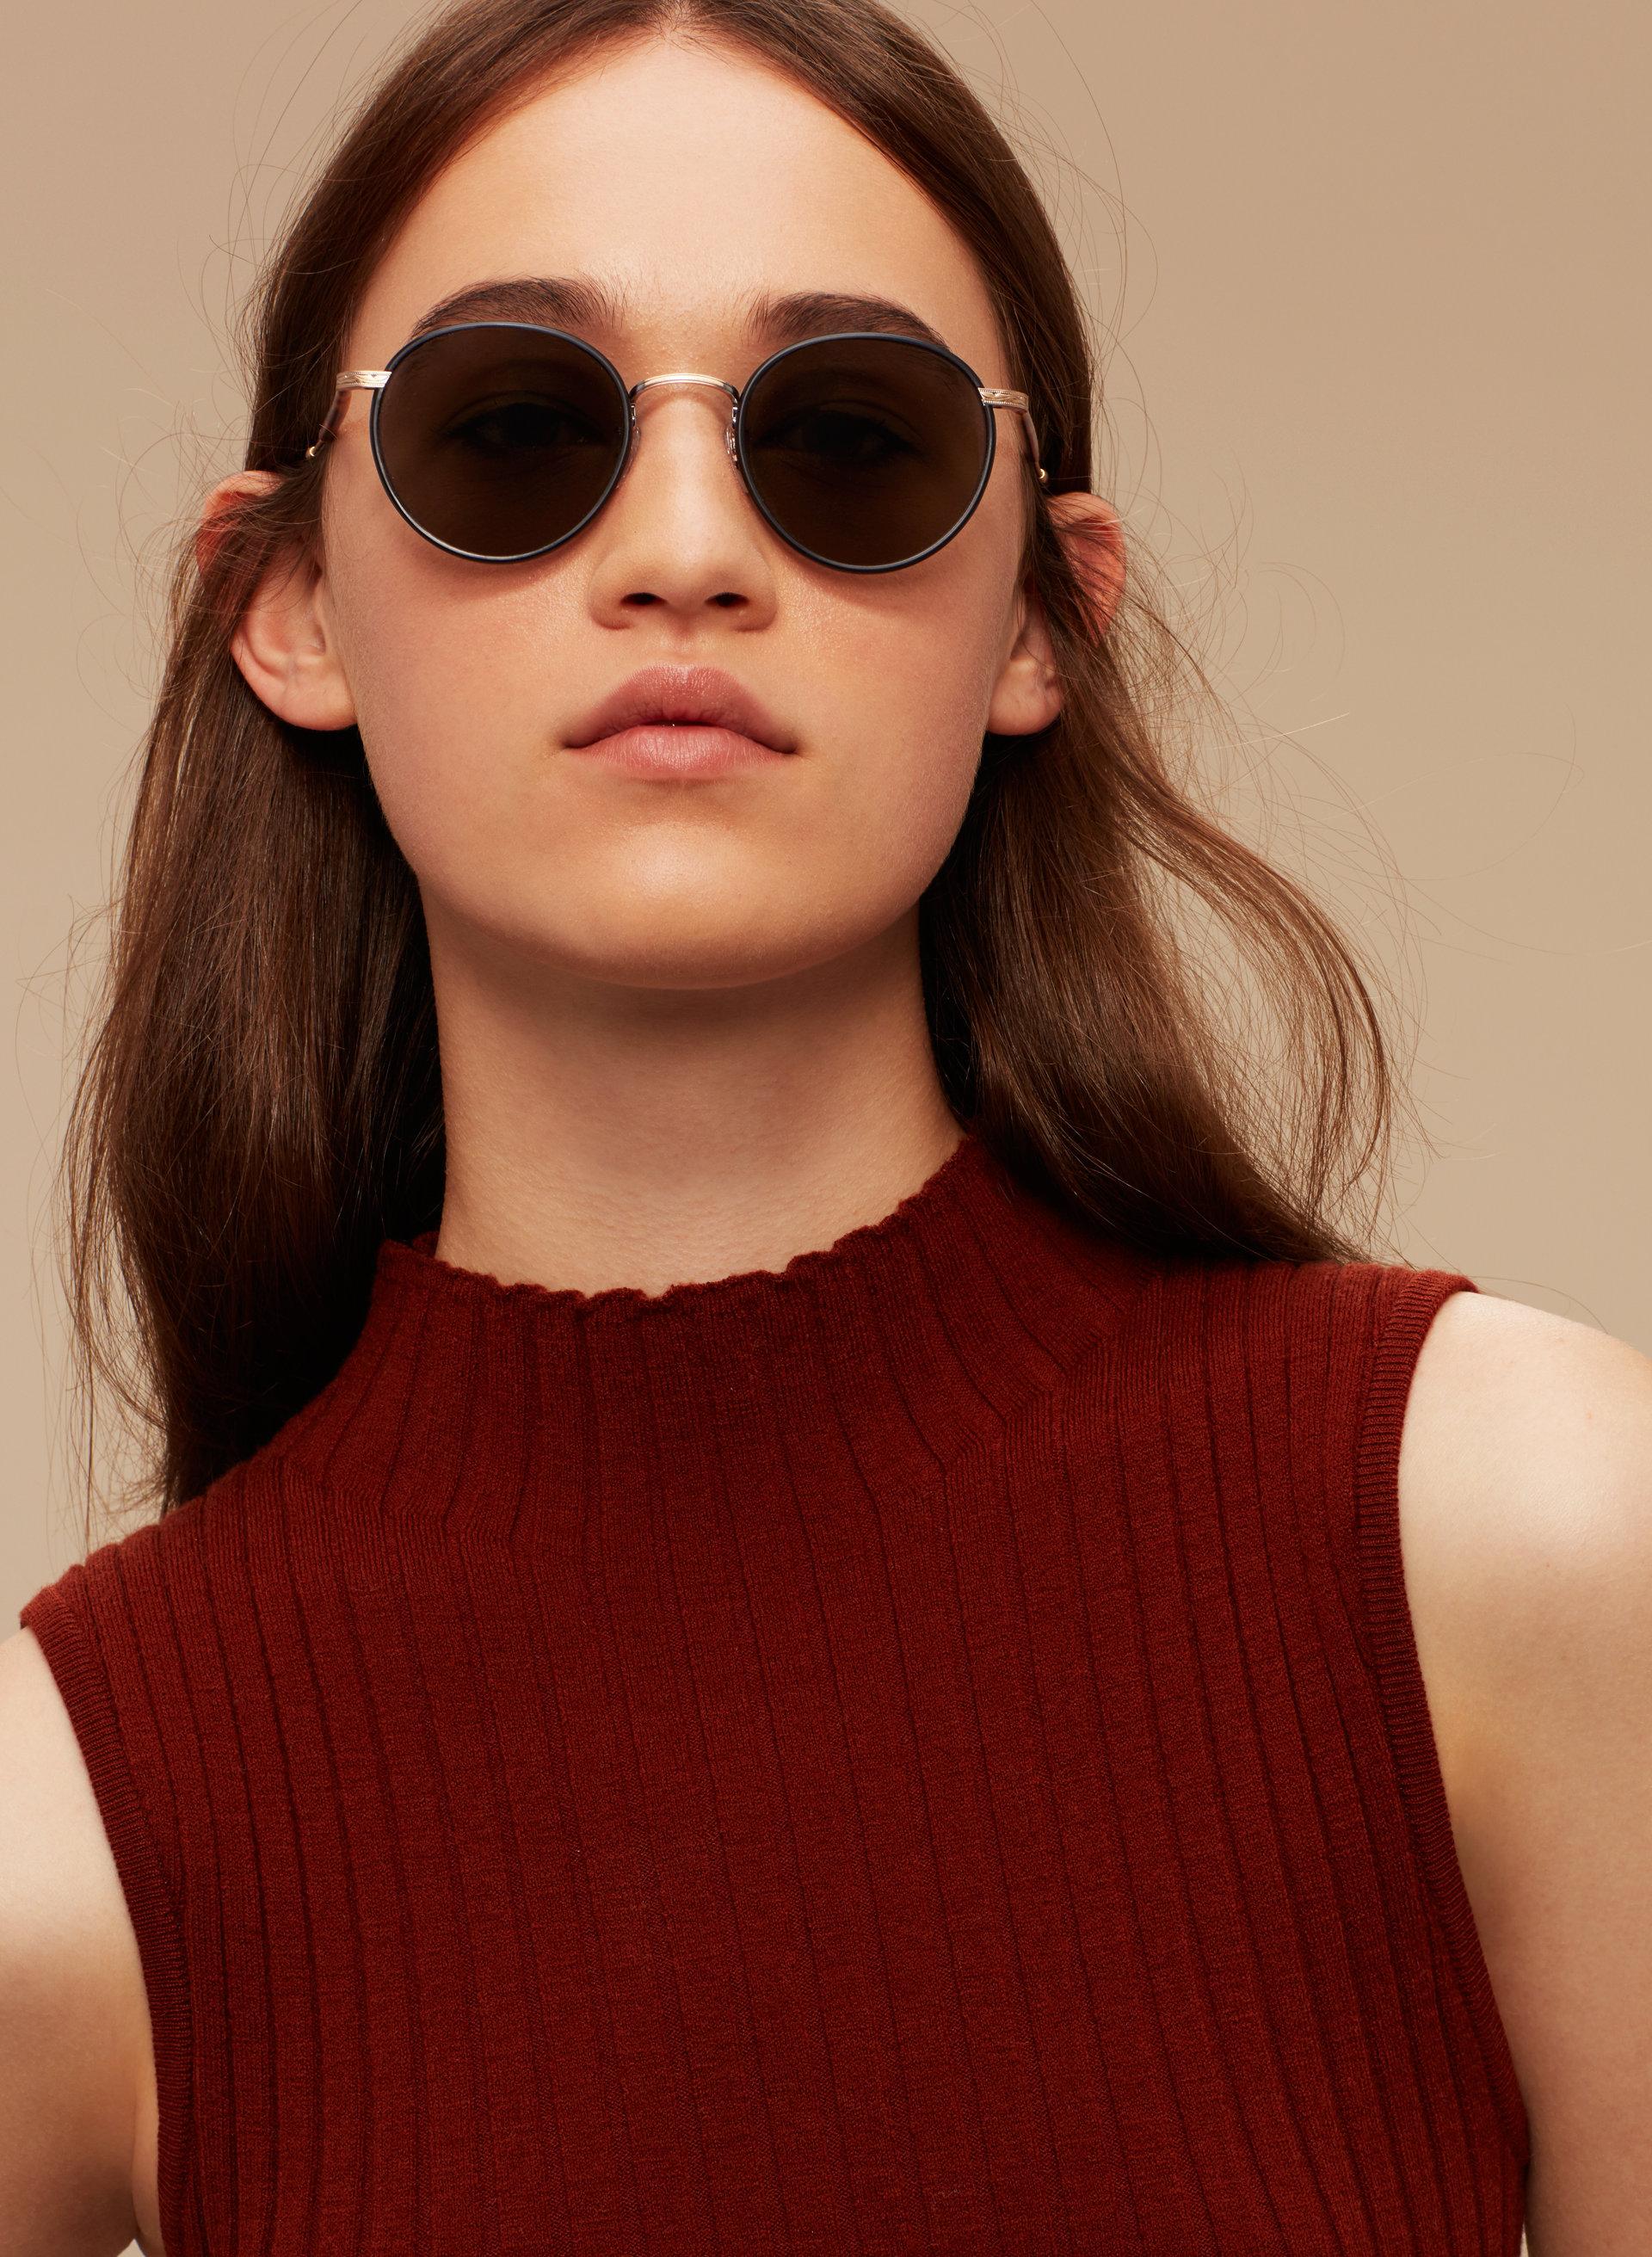 Garrett Leight Wilson round glasses Buy Cheap Sast QjYhPX1